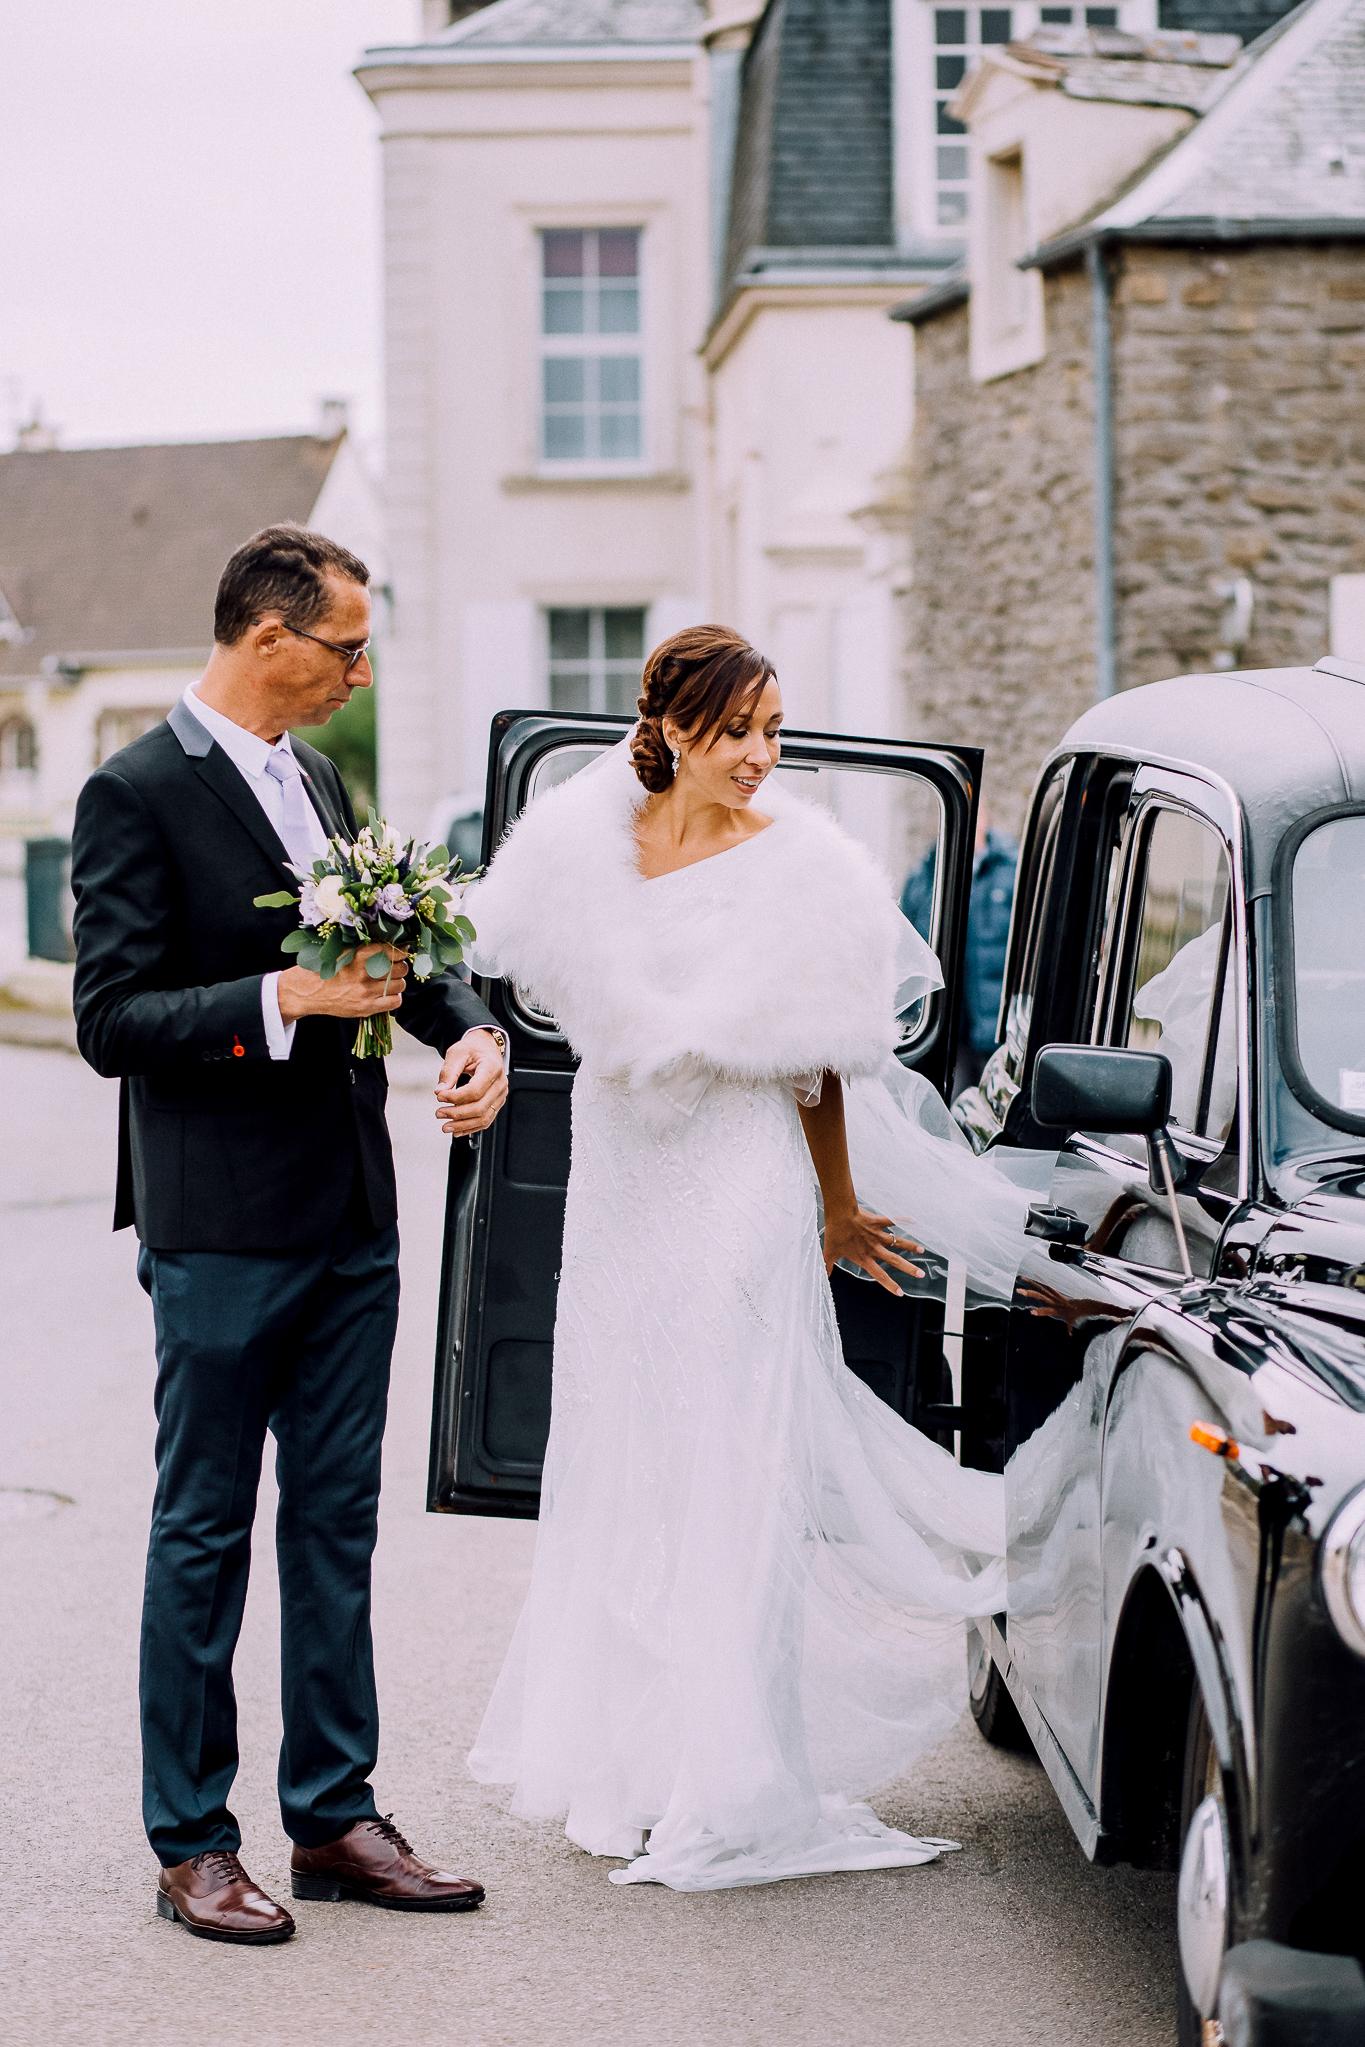 mariage Côte d'Opale, Mariage Nord pas de Calais, Mariage Hauts de France, Mariage, French Wedding, Wedding Decor, Dixie Martin Photography